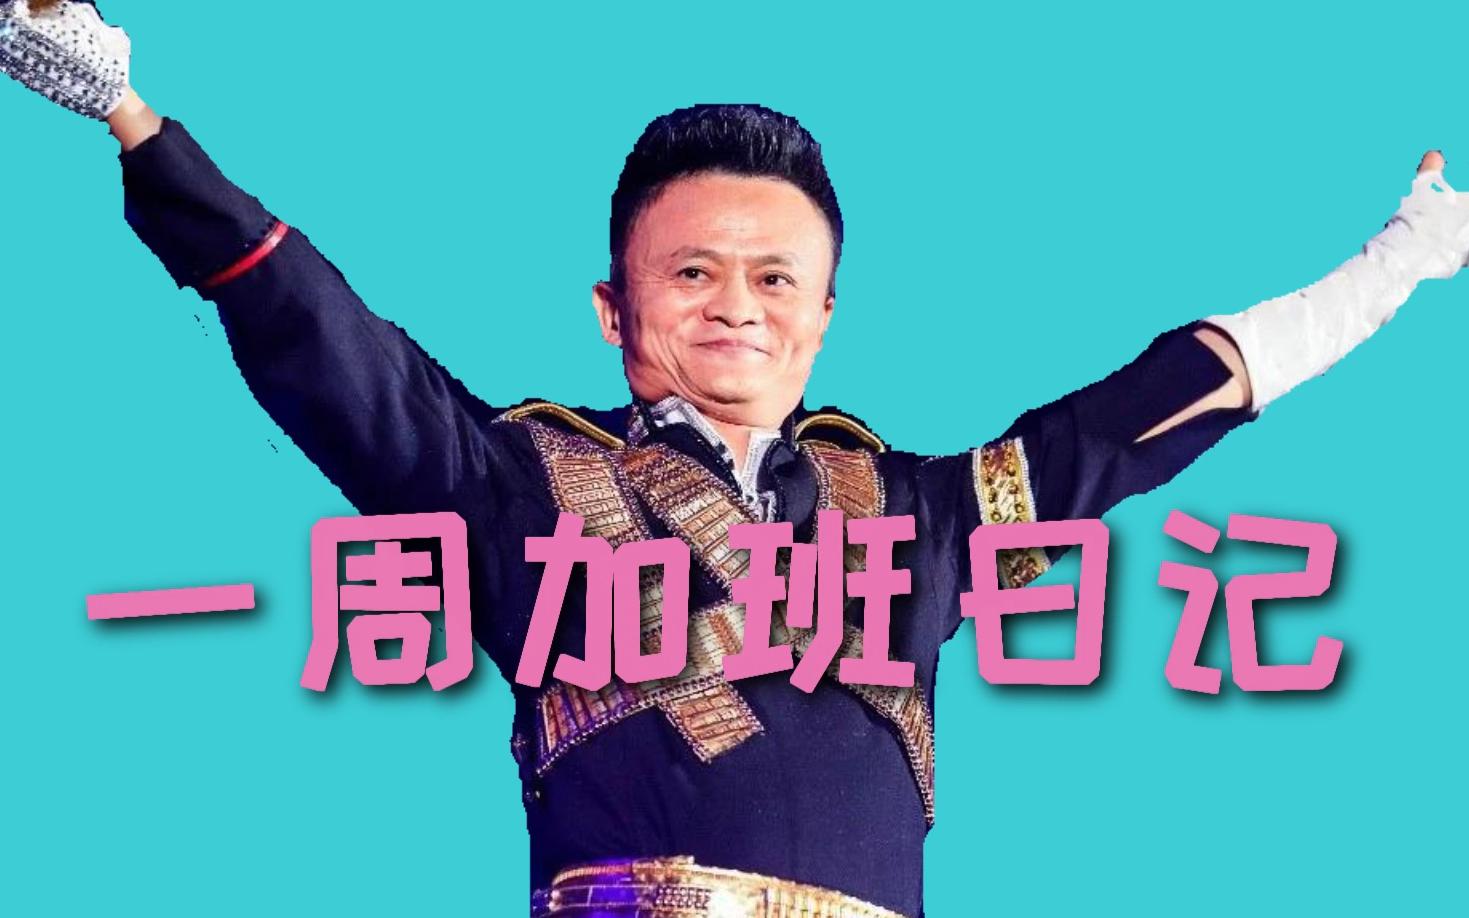 【AC摸鱼日记】【独家·马云单曲】一周加班日记